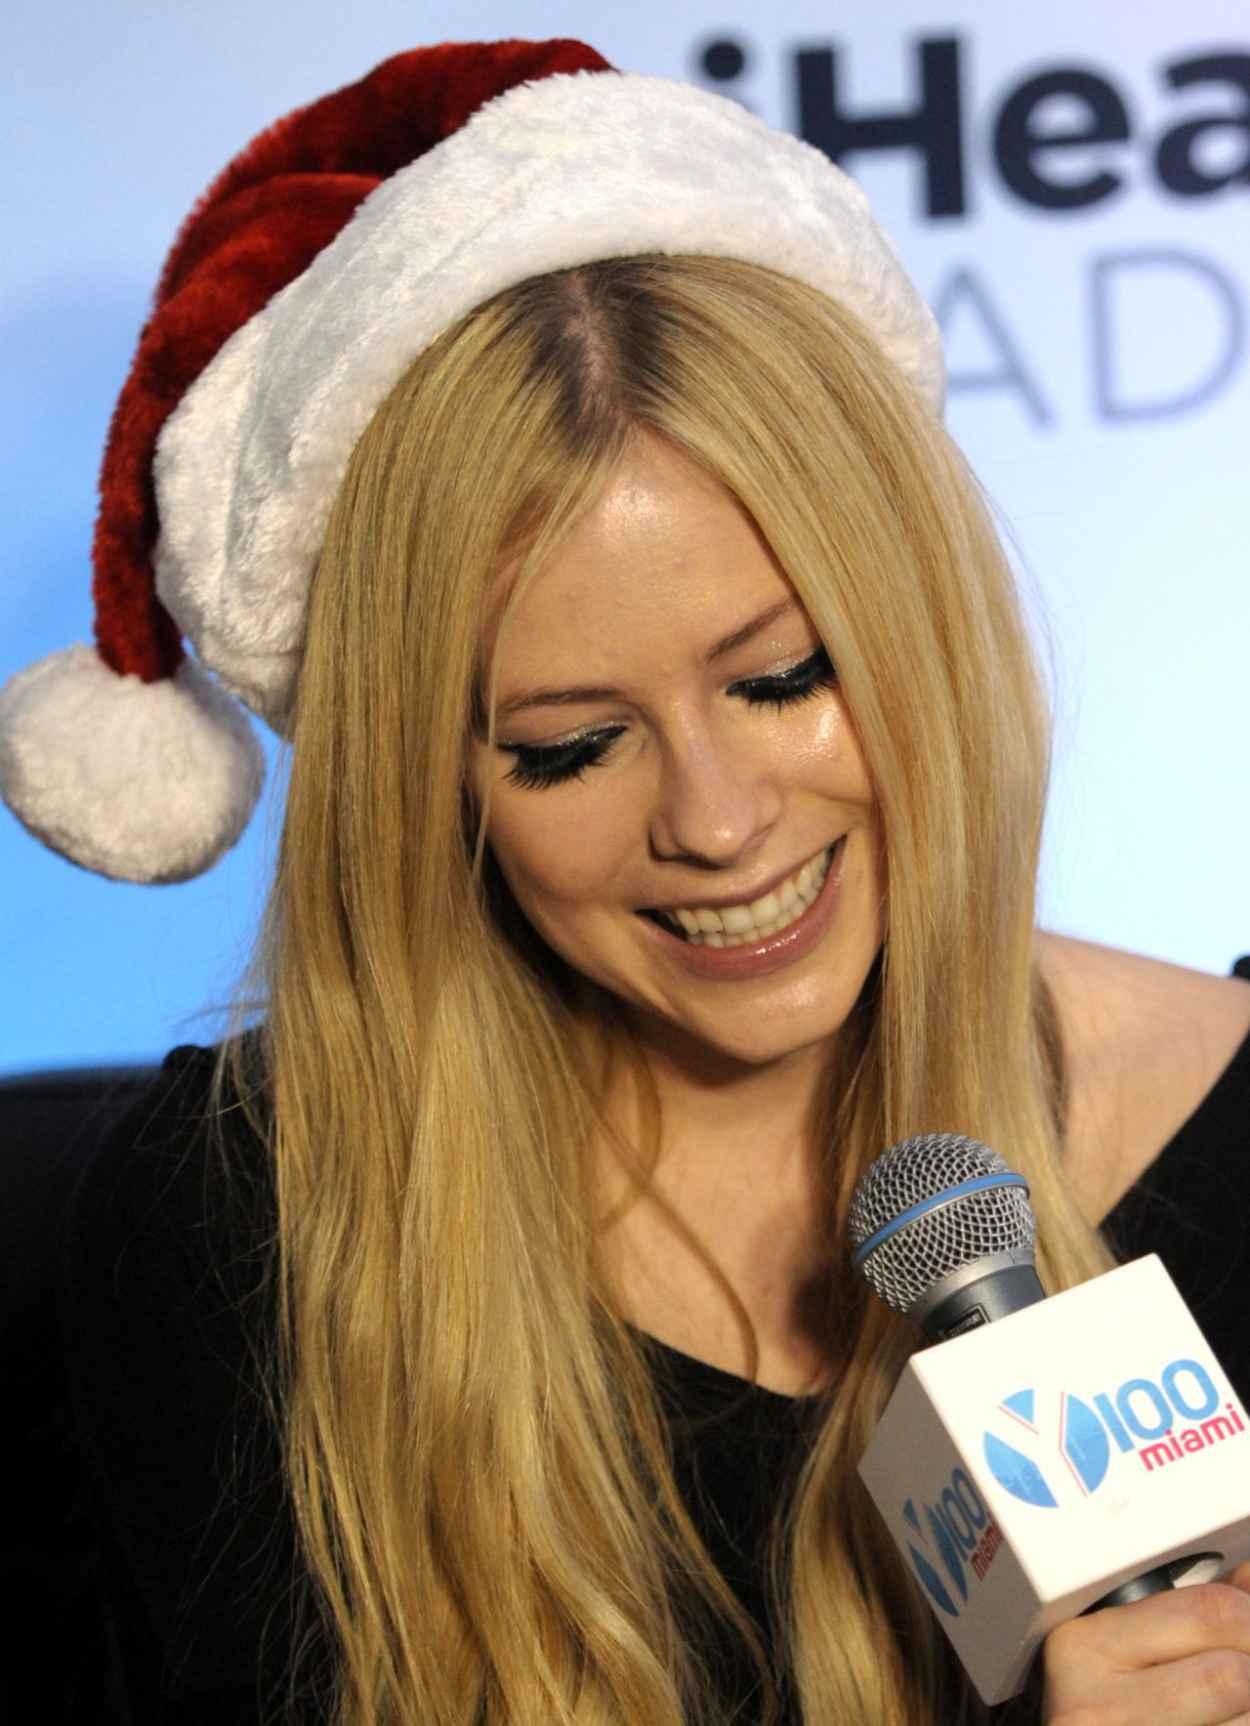 Avril Lavigne Performs at Y100 Jingle Ball in Miami-1